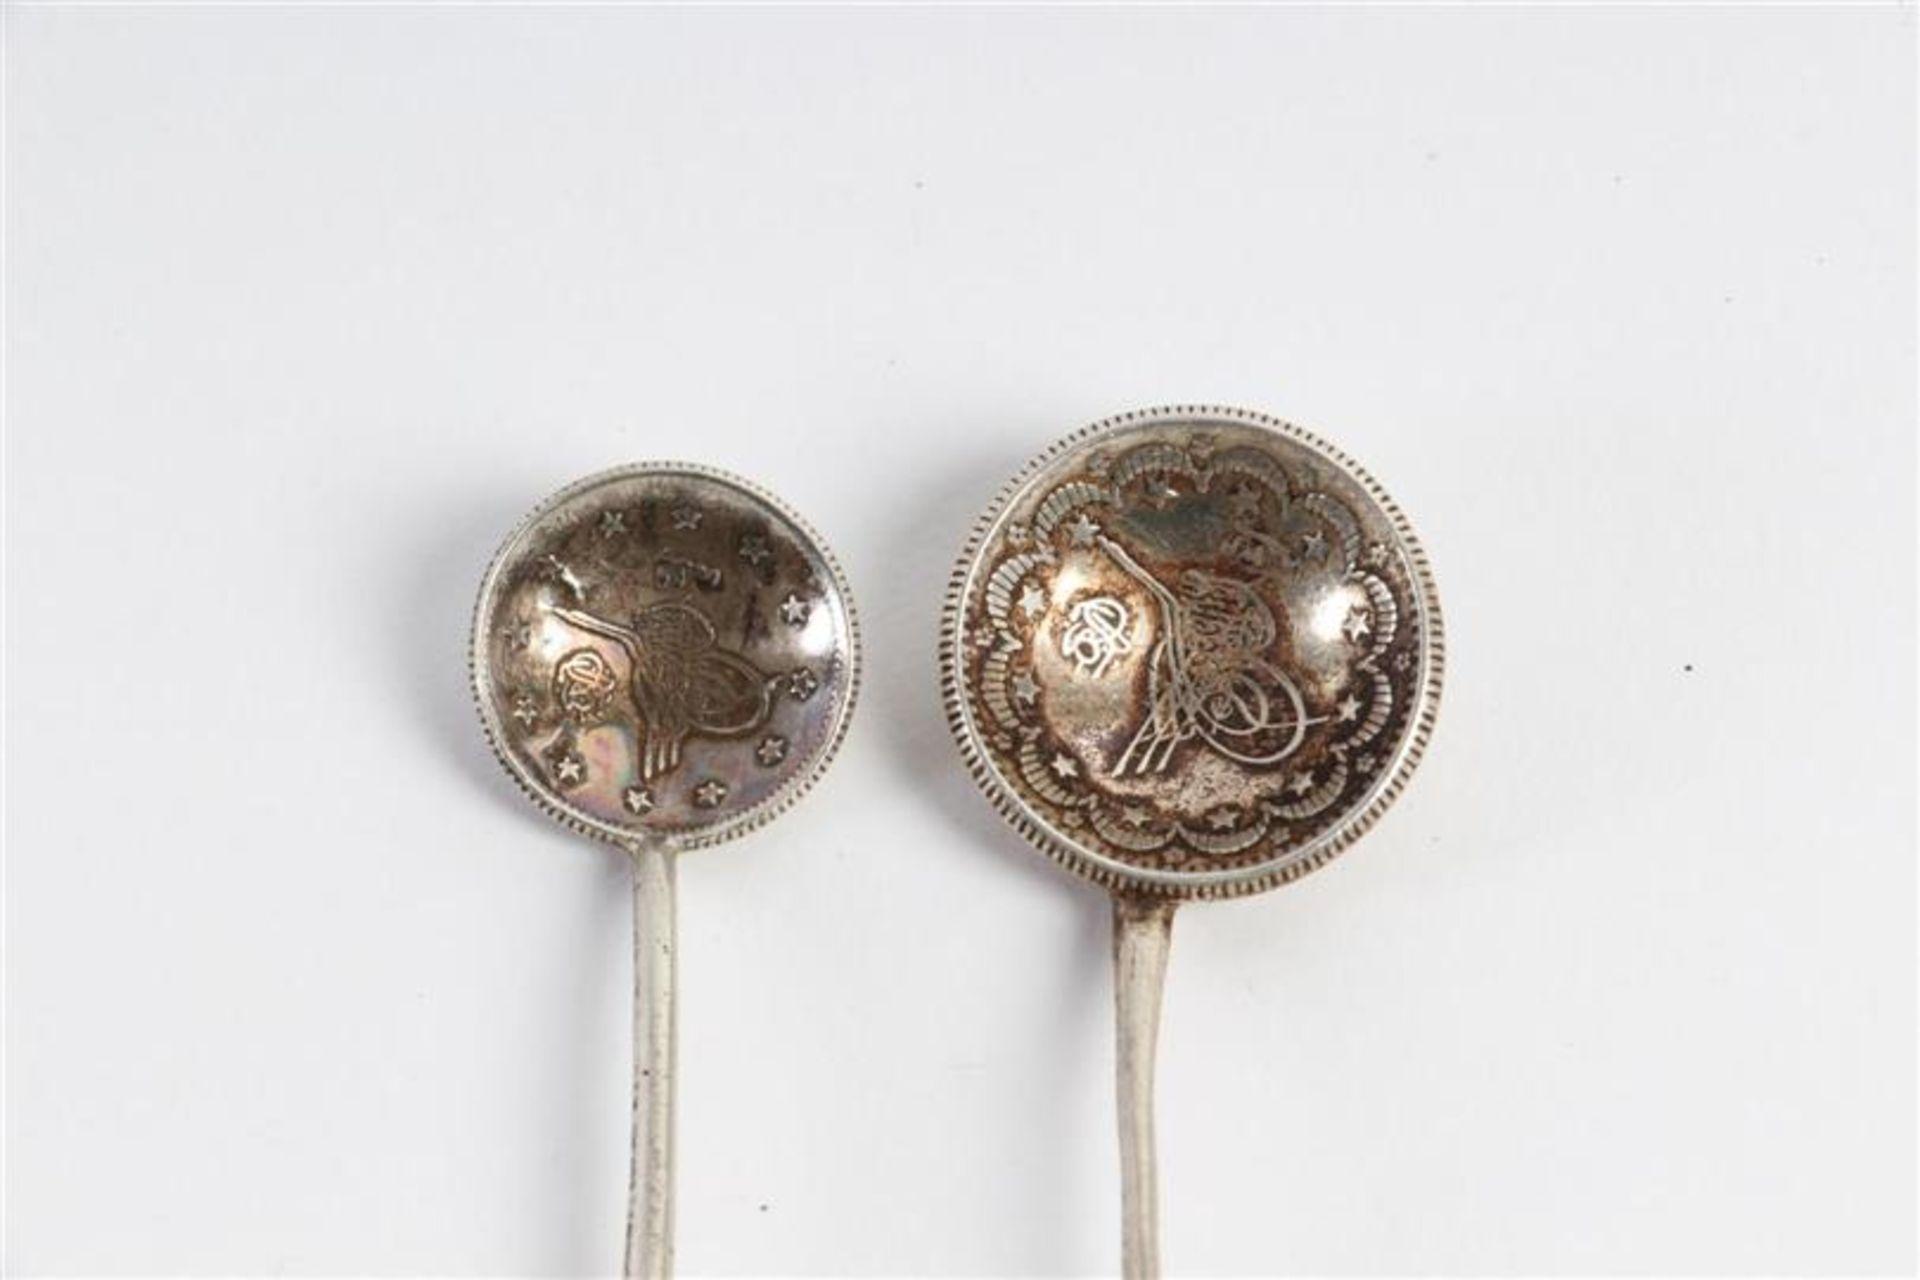 Los 58 - Divers Djokja w.o. miniaturen. Toegevoegd vier opiumgewichten.